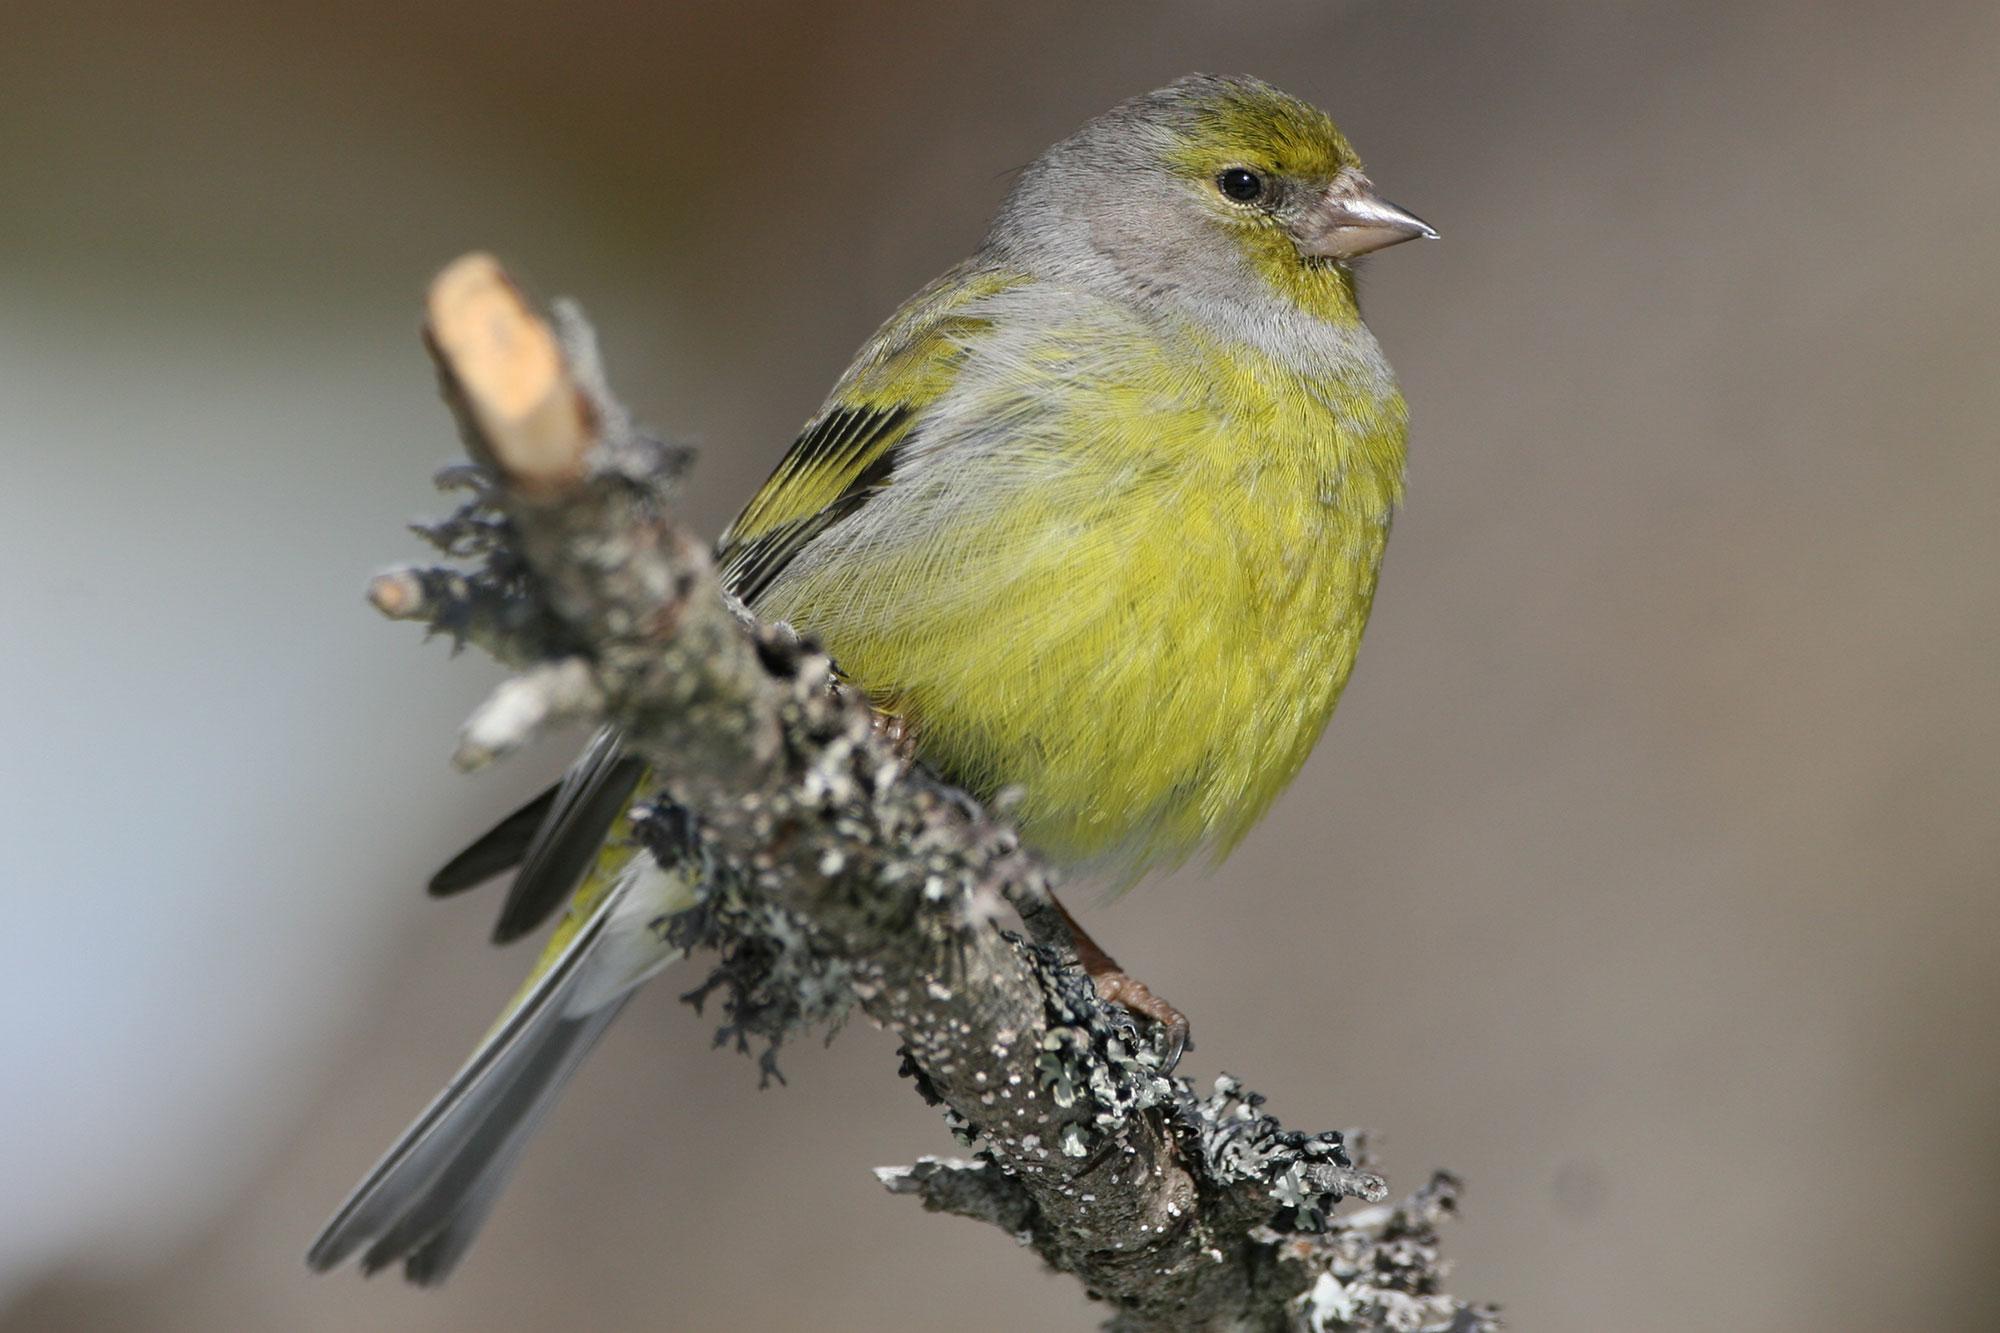 Vogelbeobachtung datiert